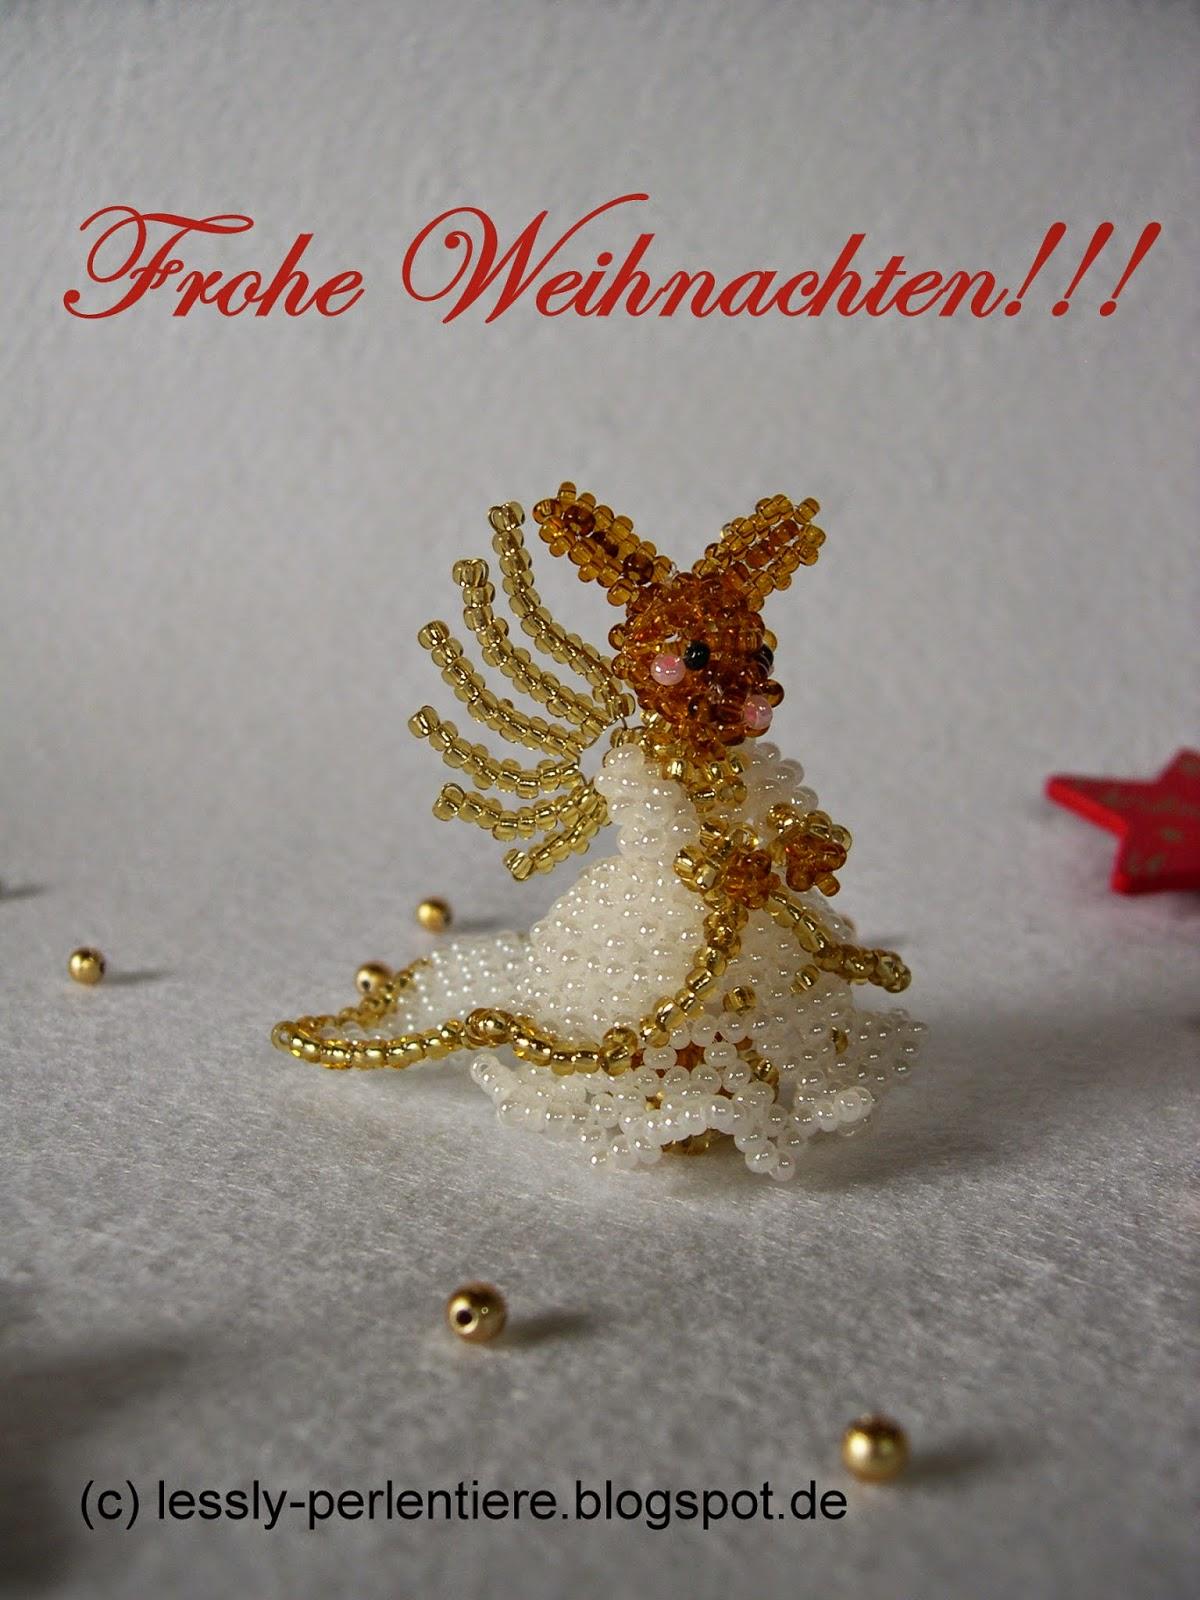 http://lessly-perlentiere.blogspot.de/2014/12/frohe-weihnachten.html